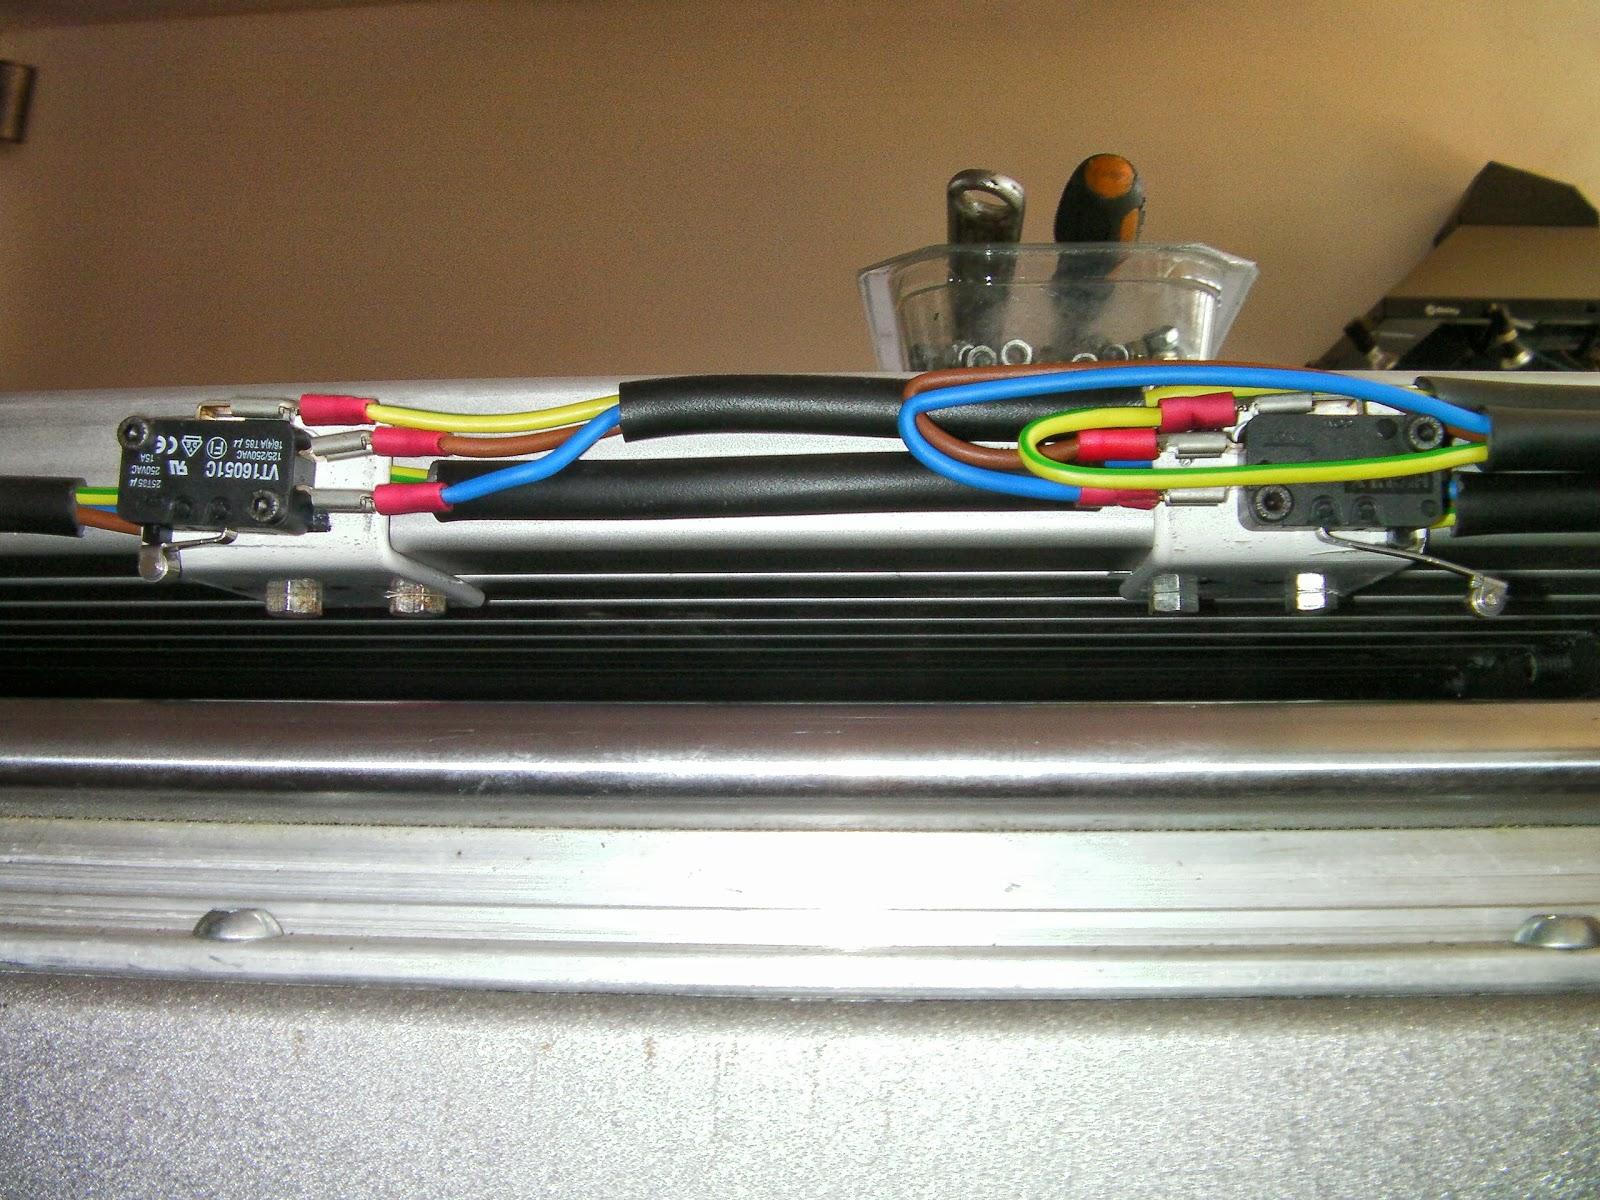 Fresadora router cnc 4 ejes casera septiembre 2013 - Como camuflar cables ...